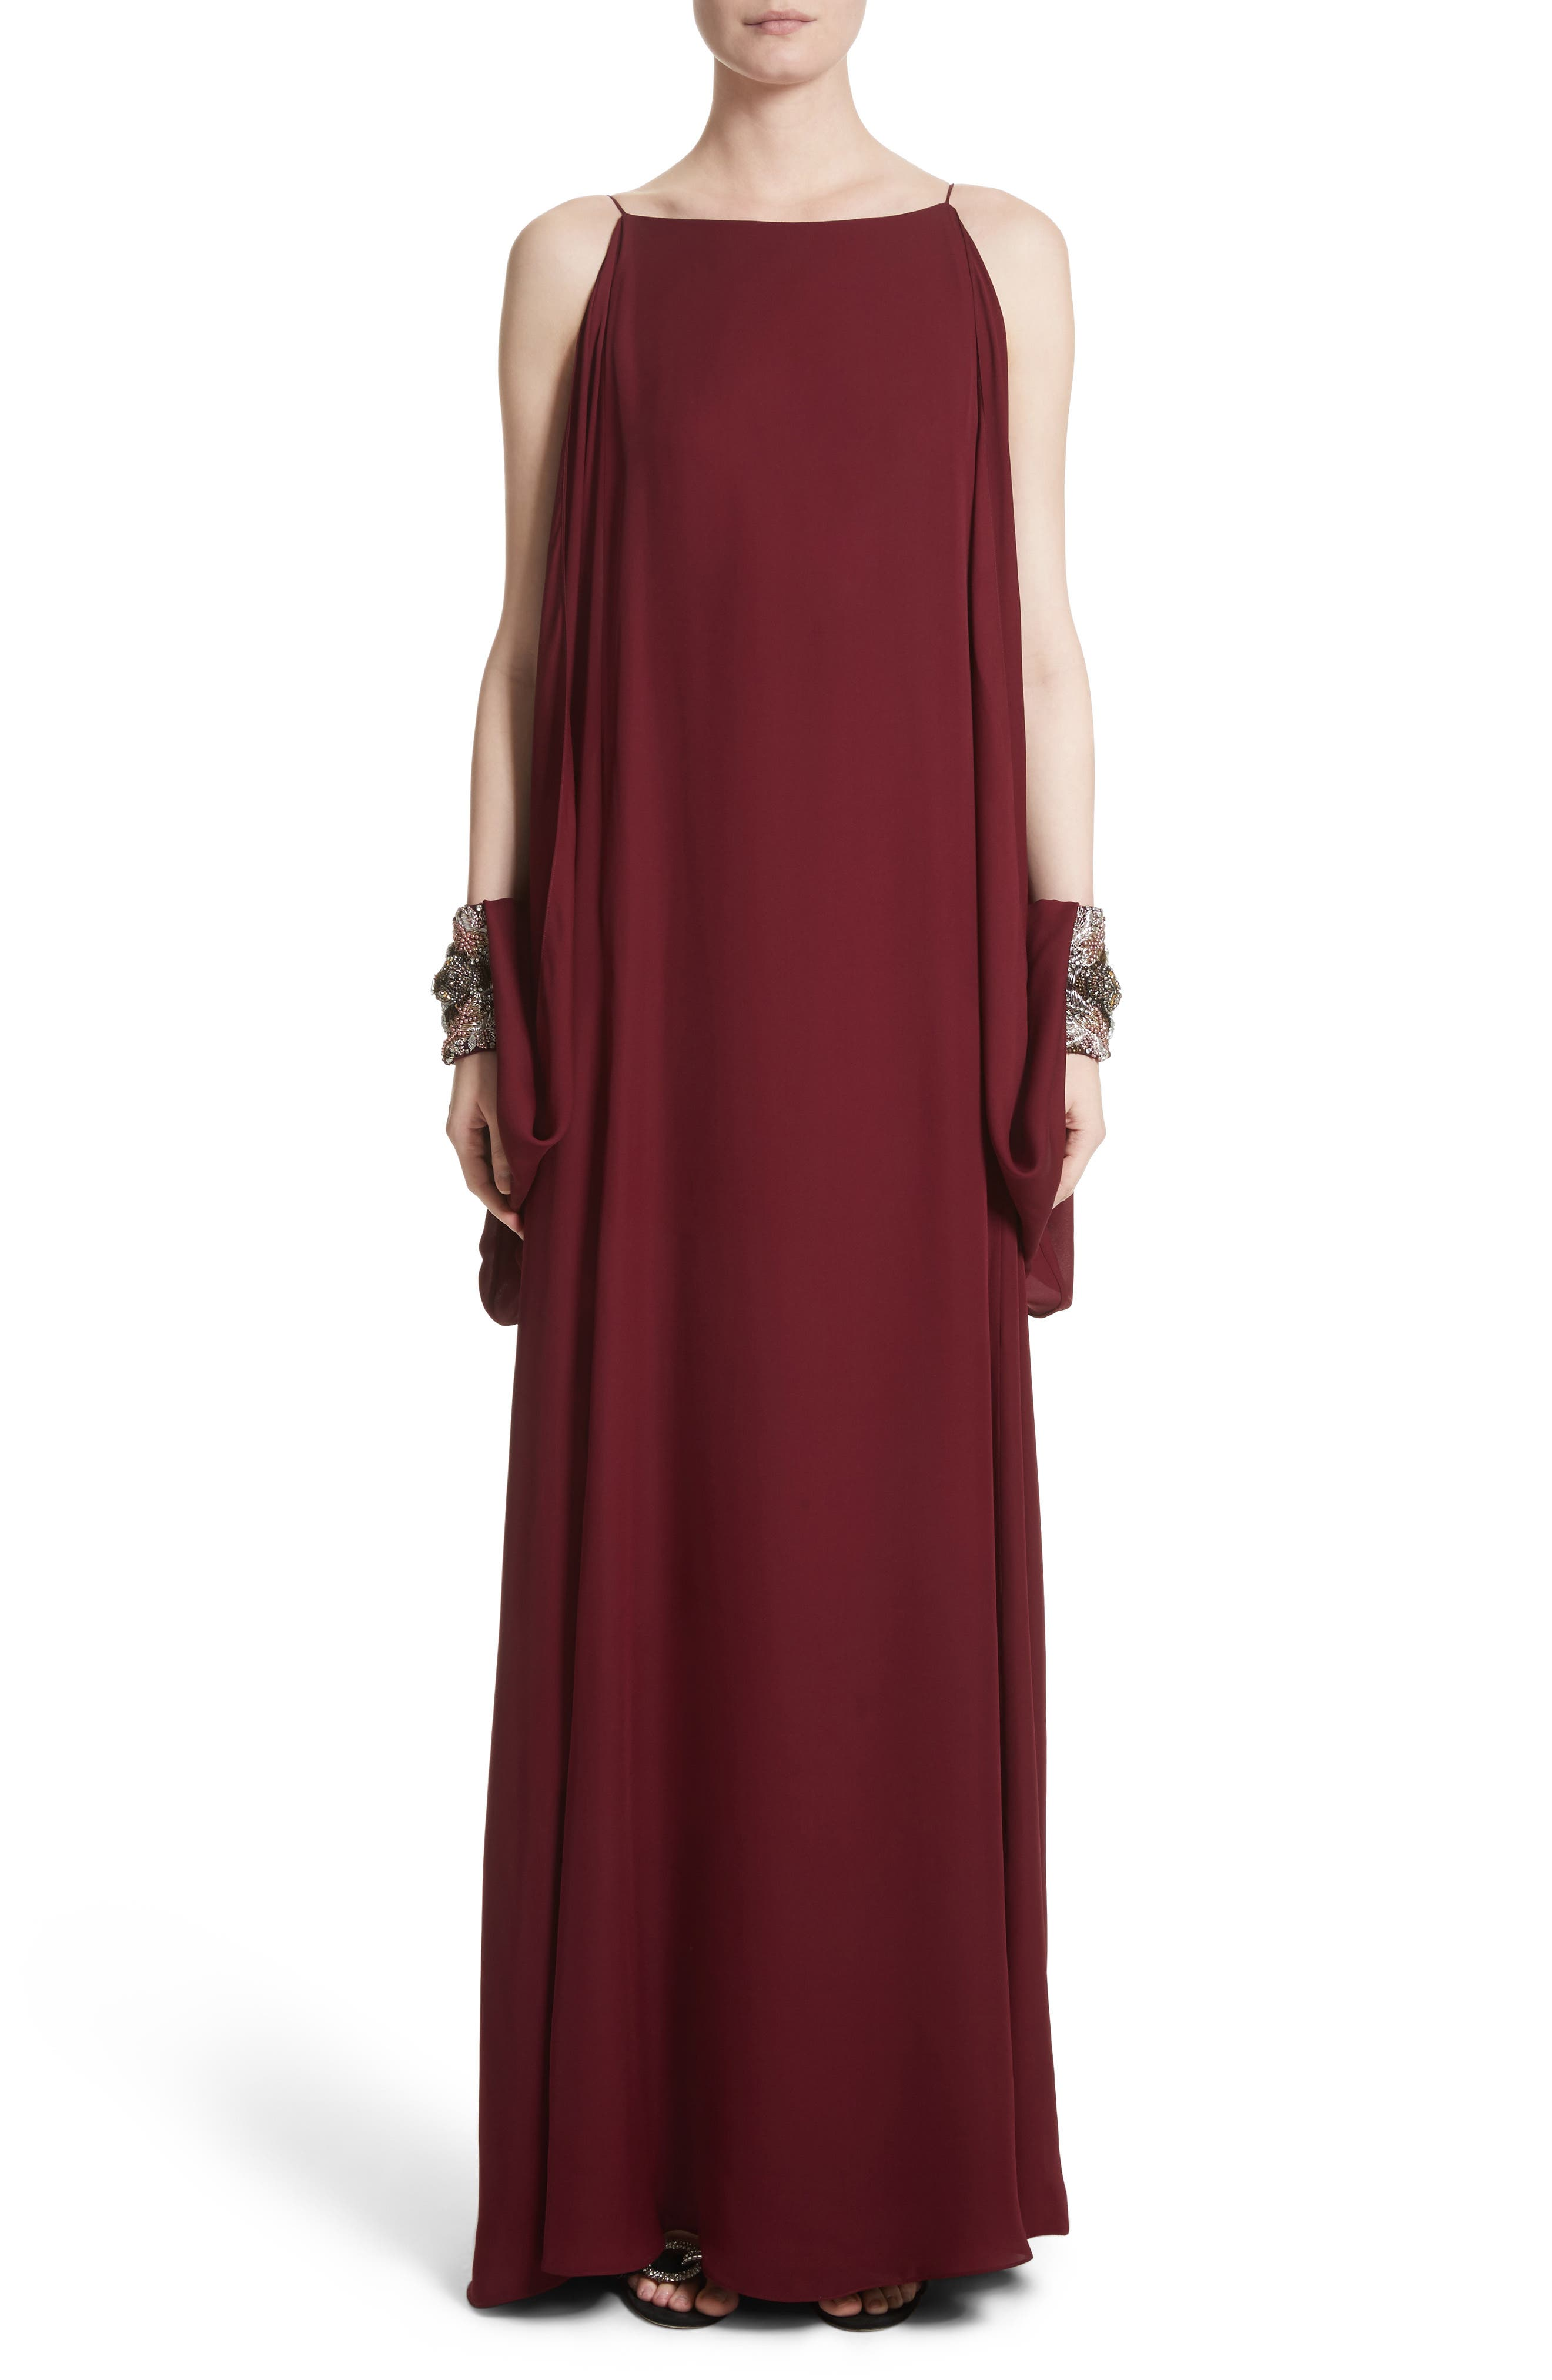 Main Image - Badgley Mischka Couture Embellished Cuff Silk Caftan